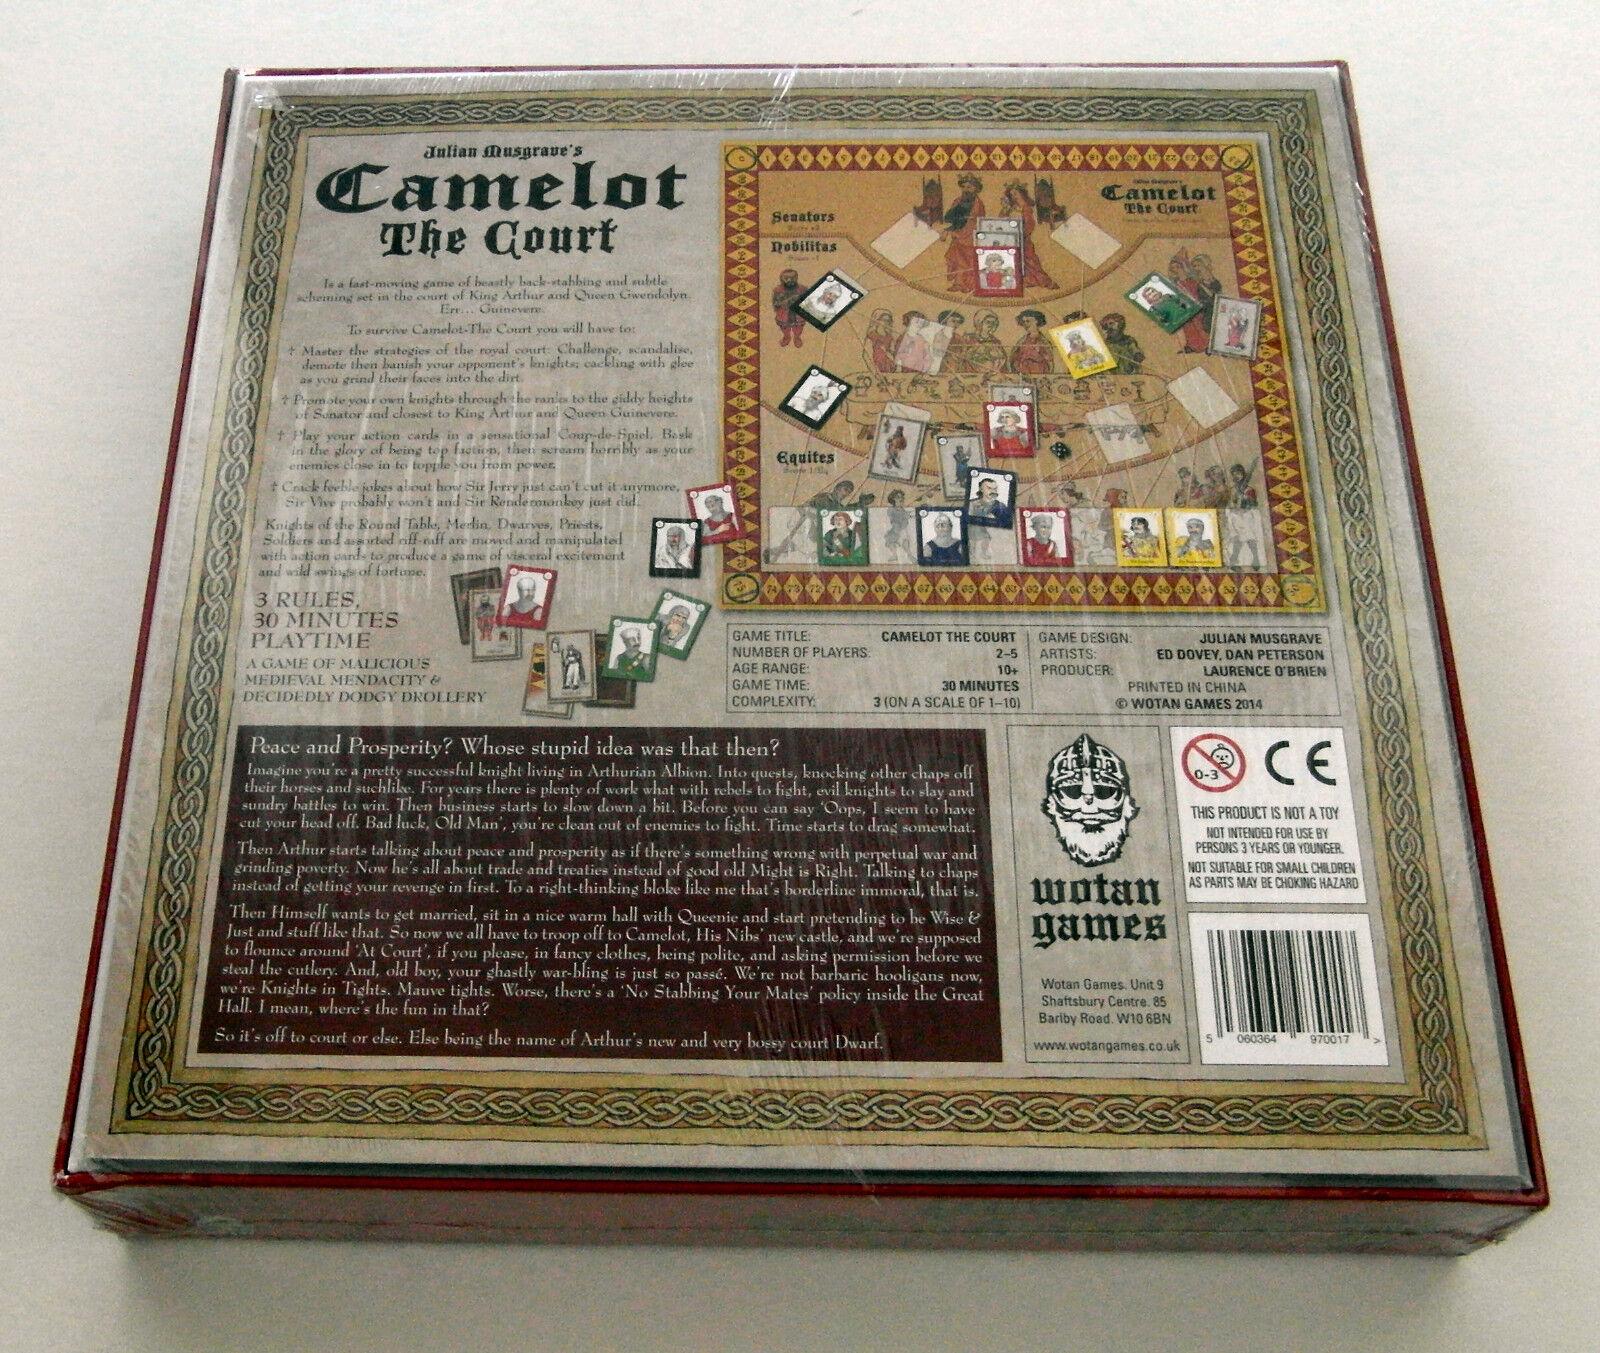 Camelot  The Court - - - Wotan Games - 2014 3eccee